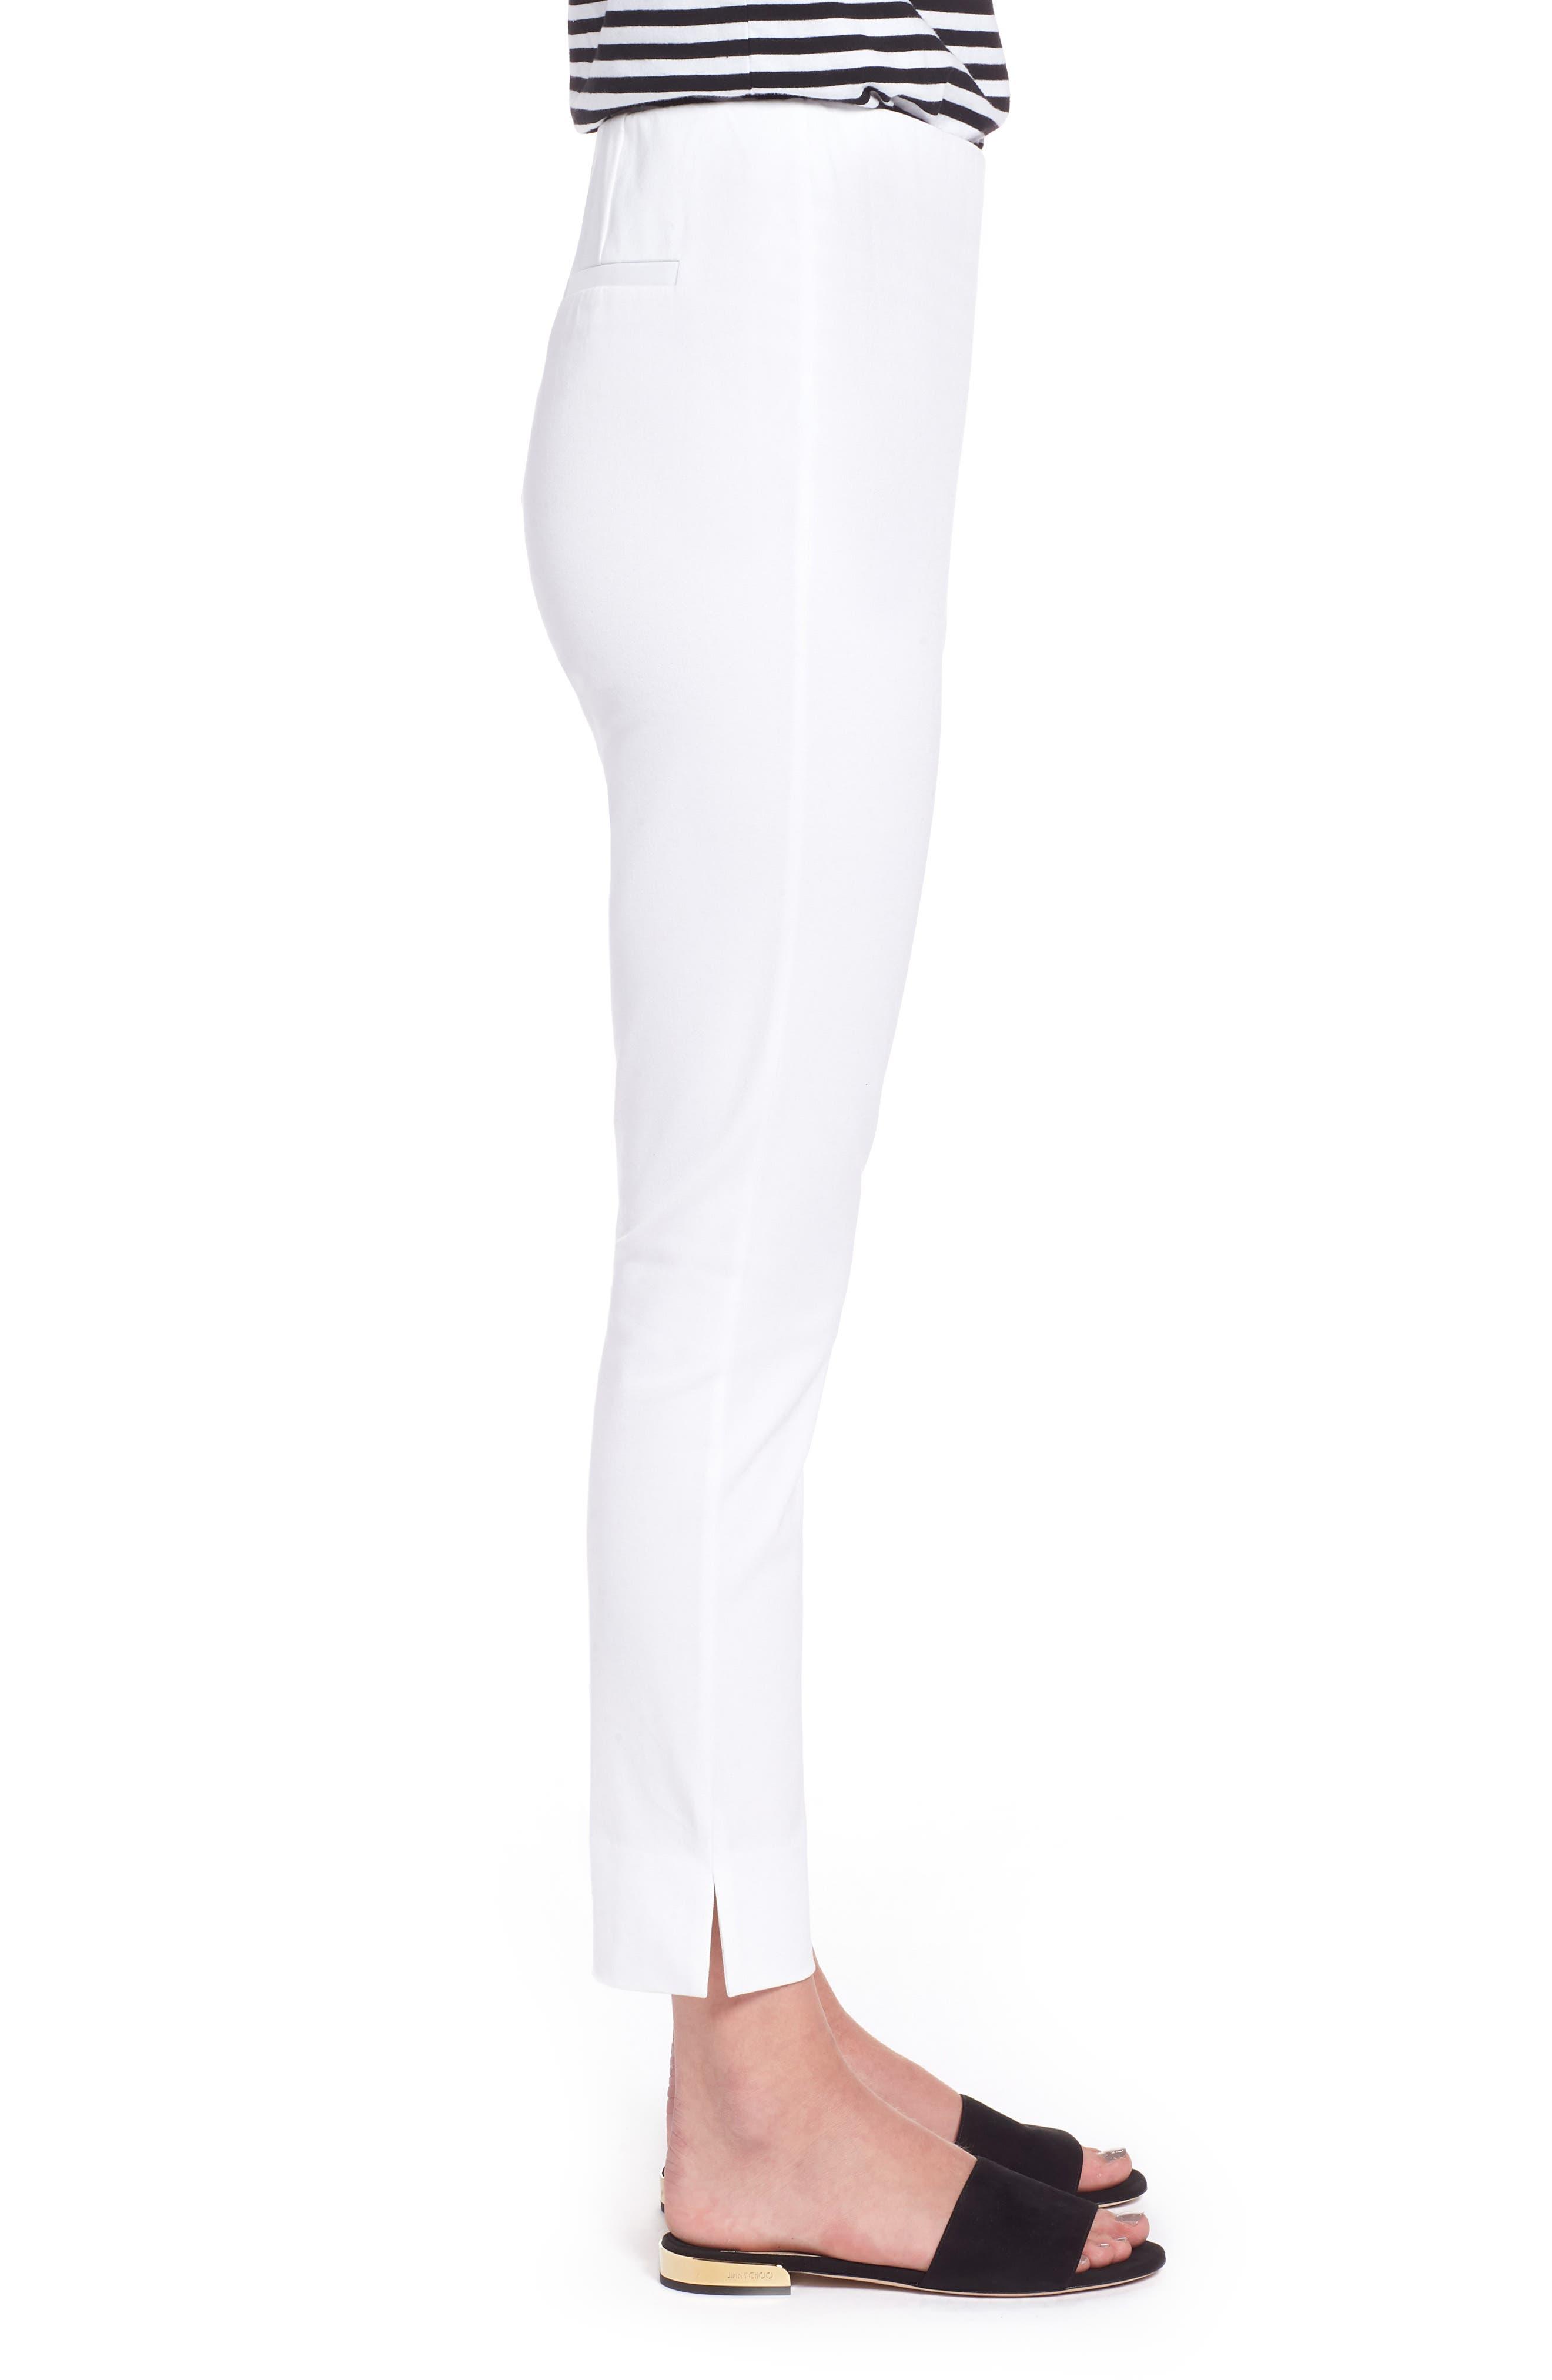 Skinny Stretch Pants,                             Alternate thumbnail 3, color,                             WHITE